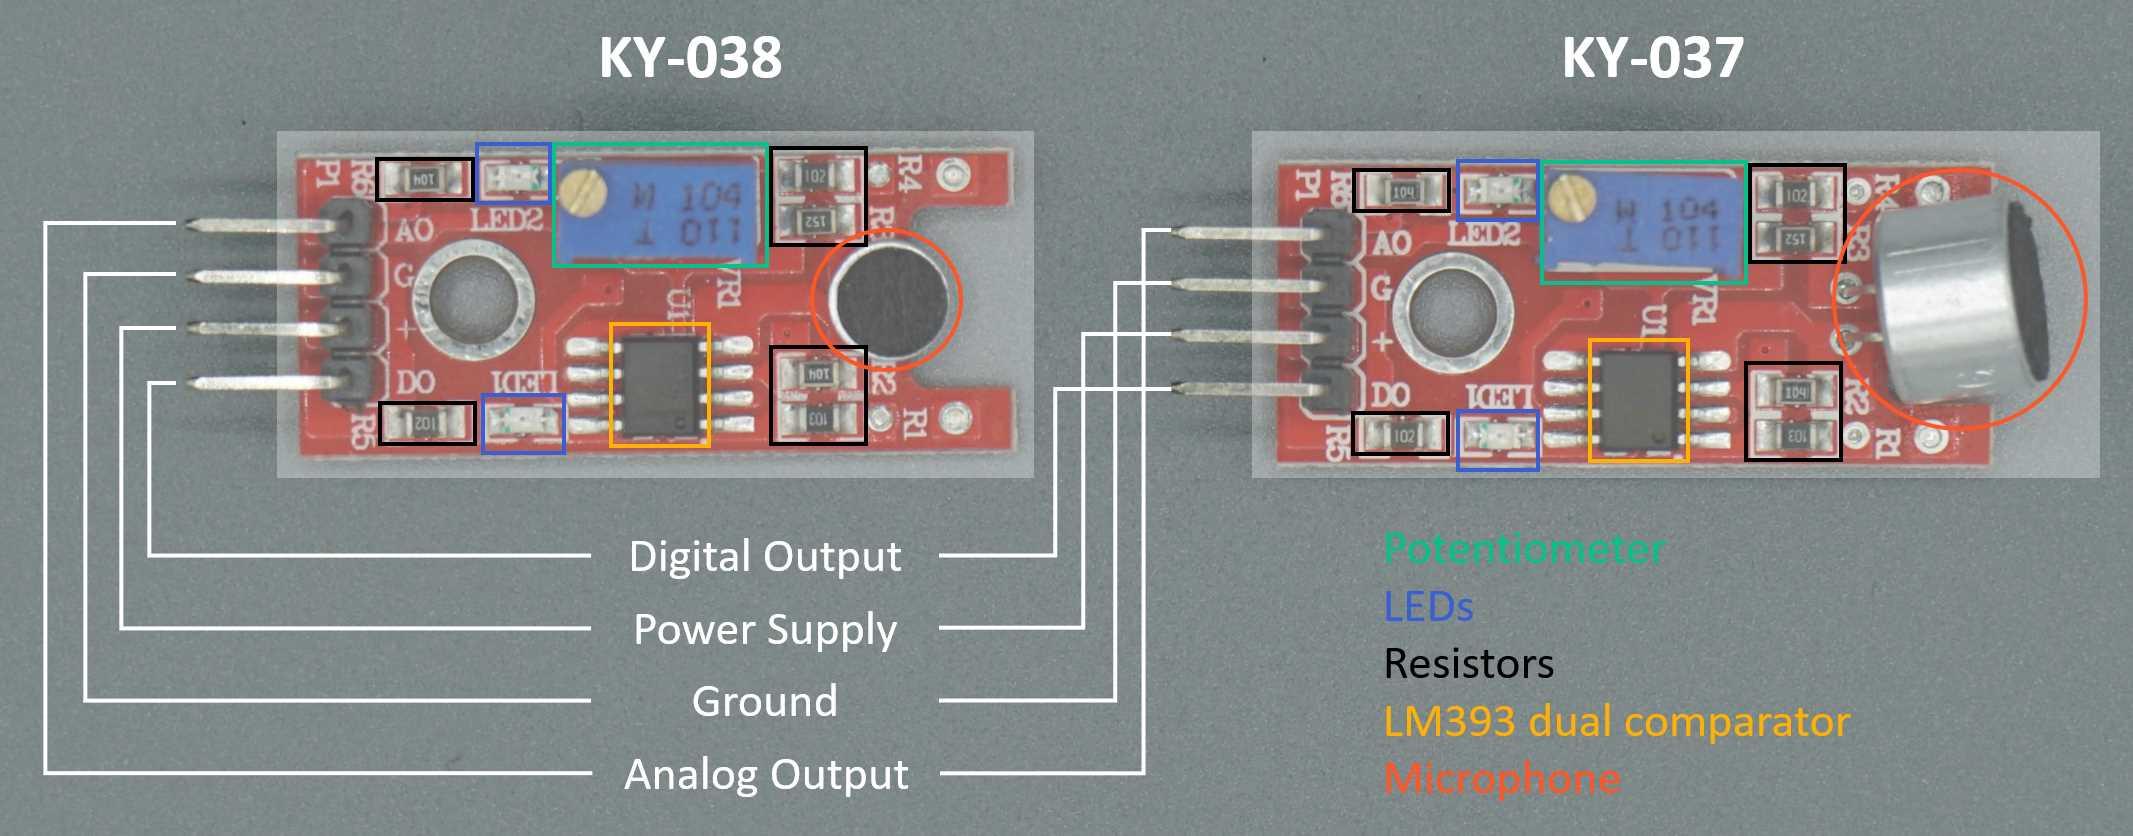 KY-038 KY-037 Microphone Sound Sensor Module Overview